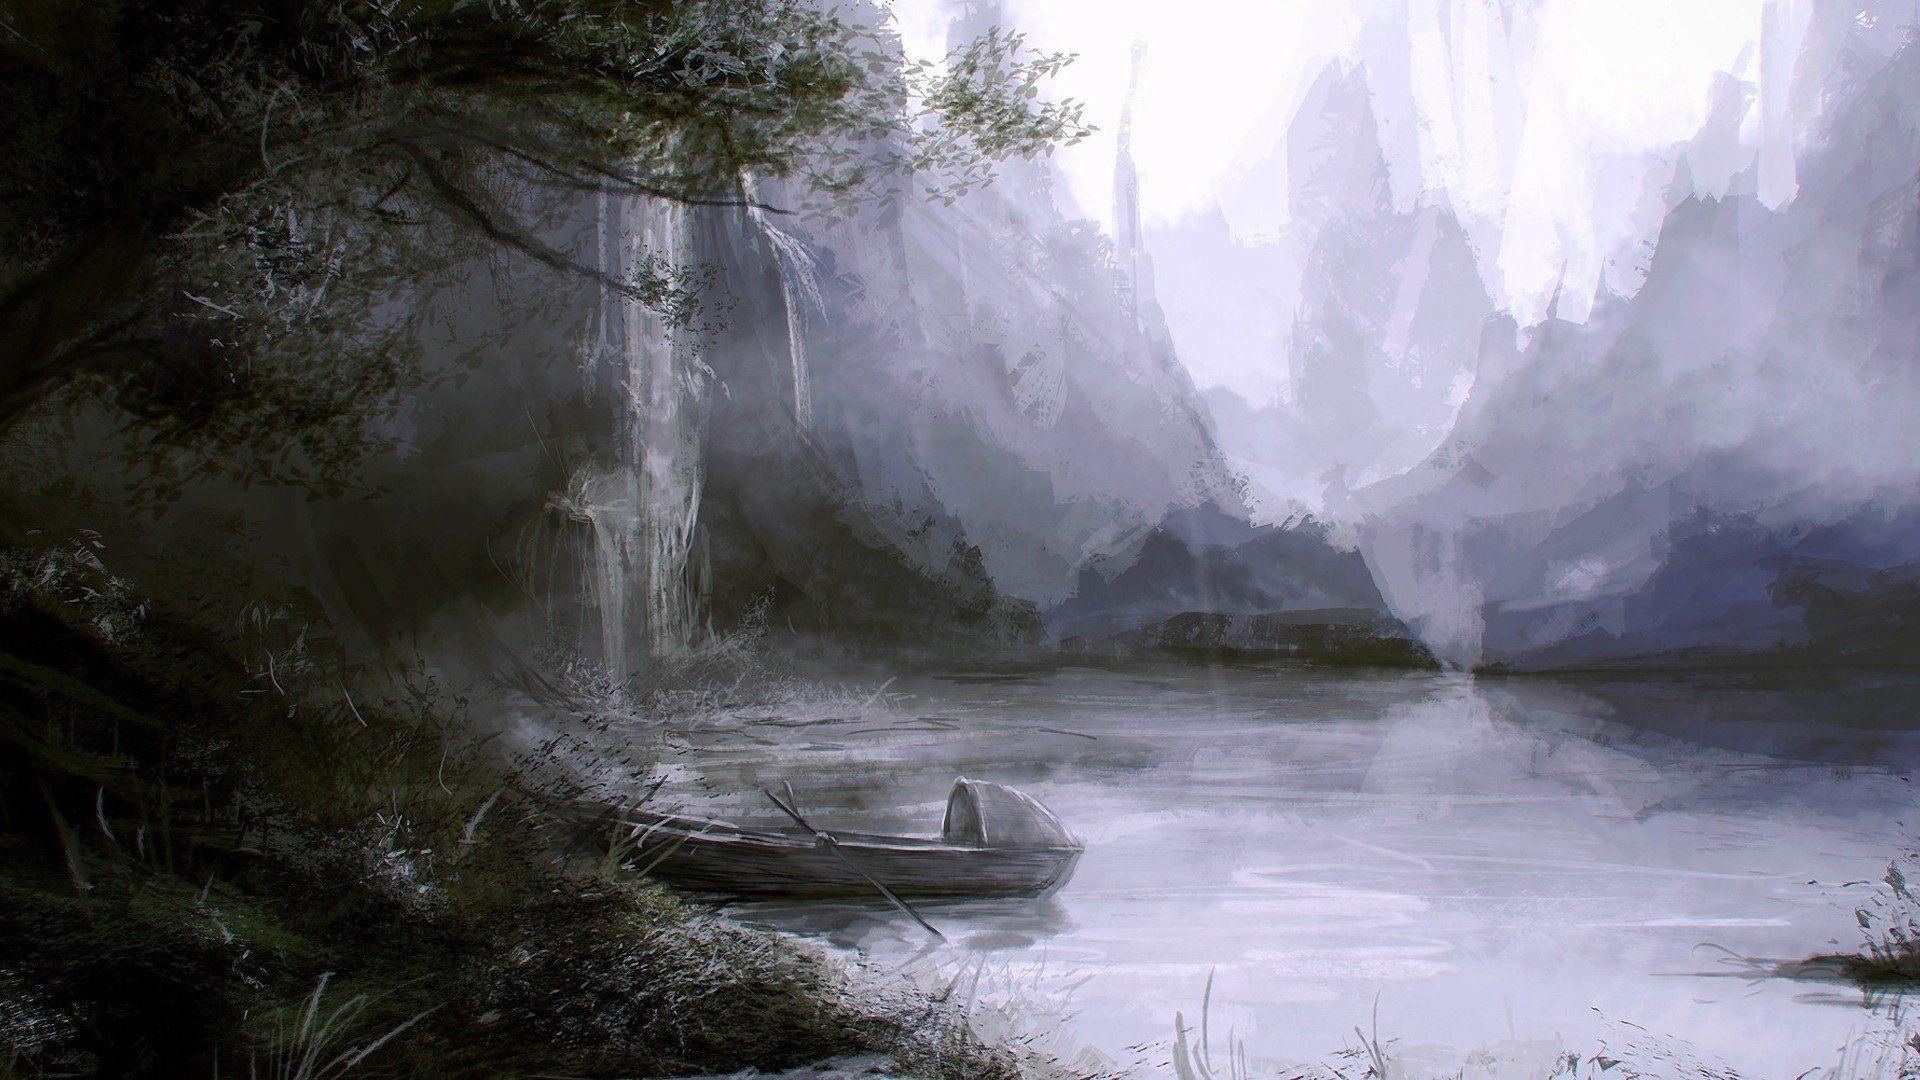 Digital Art Background wallpaper